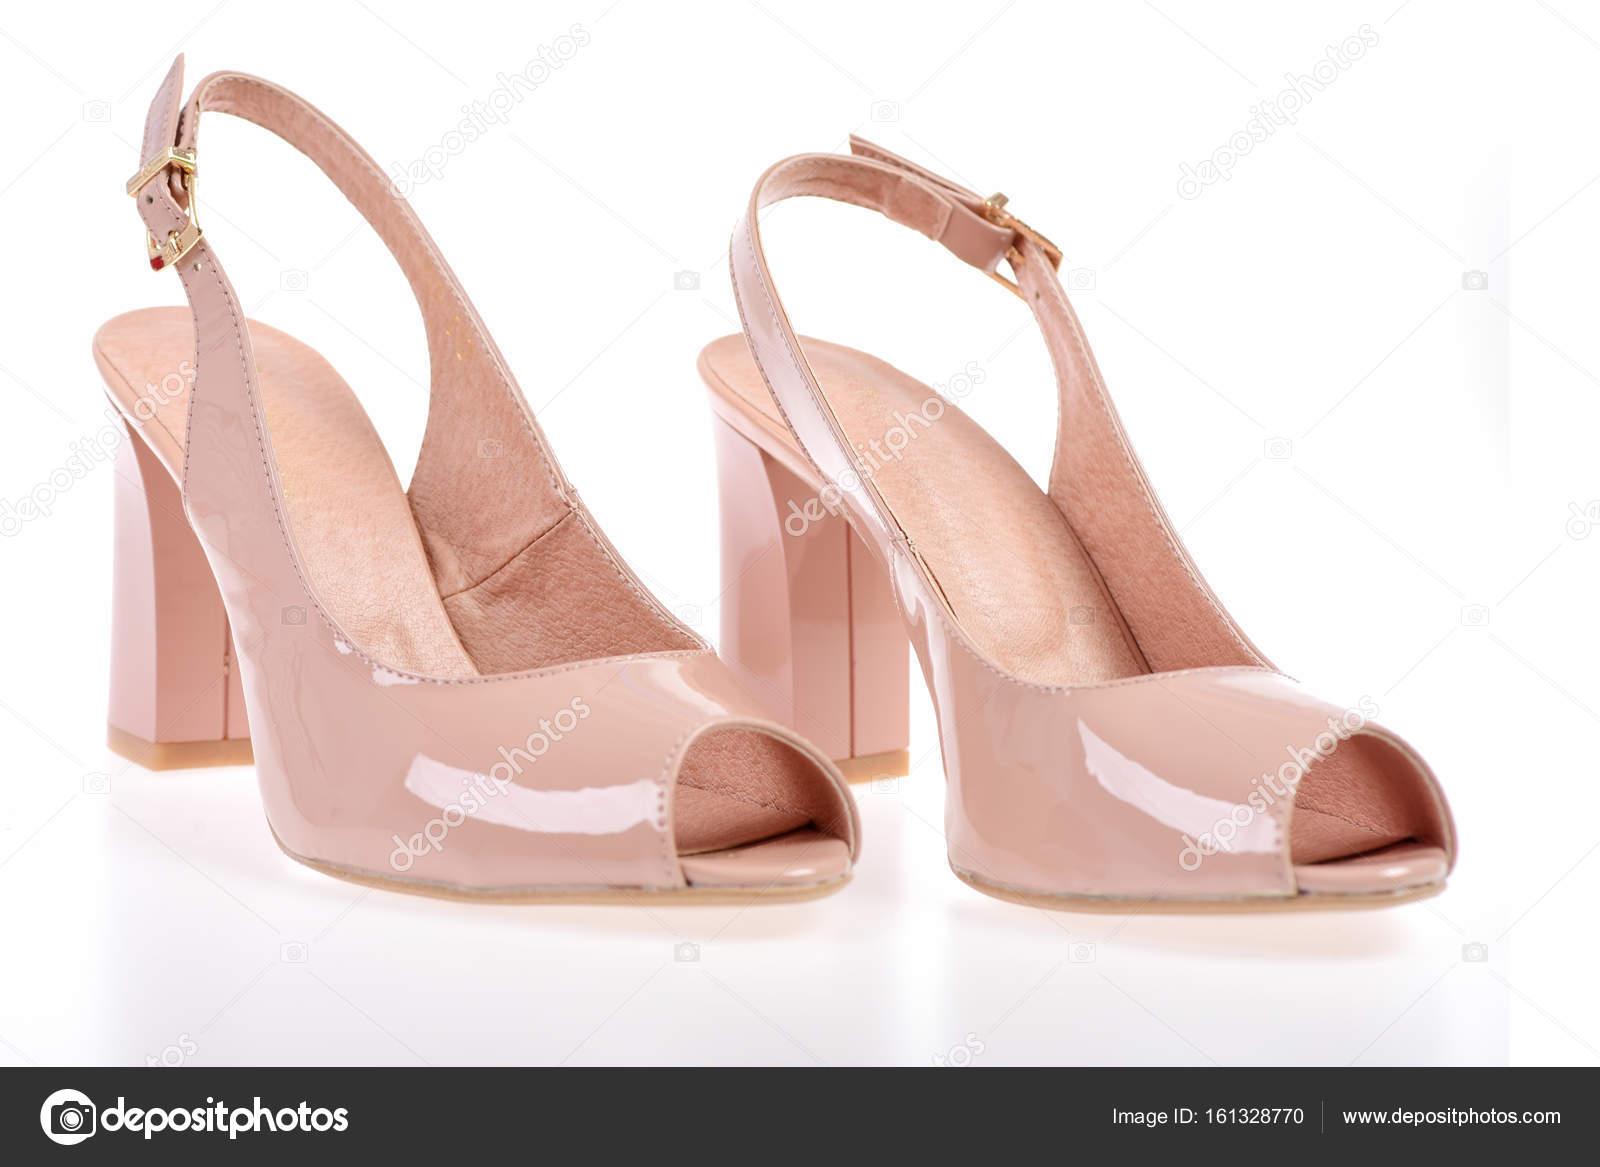 b1edd13a069 Γυναικεία ψηλοτάκουνα πέδιλα που απομονώνονται σε λευκό φόντο. Γυναικεία  δερμάτινα υποδήματα ευρεσιτεχνίας, κοντινό πλάνο. Ζευγάρι παπούτσια σε ροζ  χρώμα.